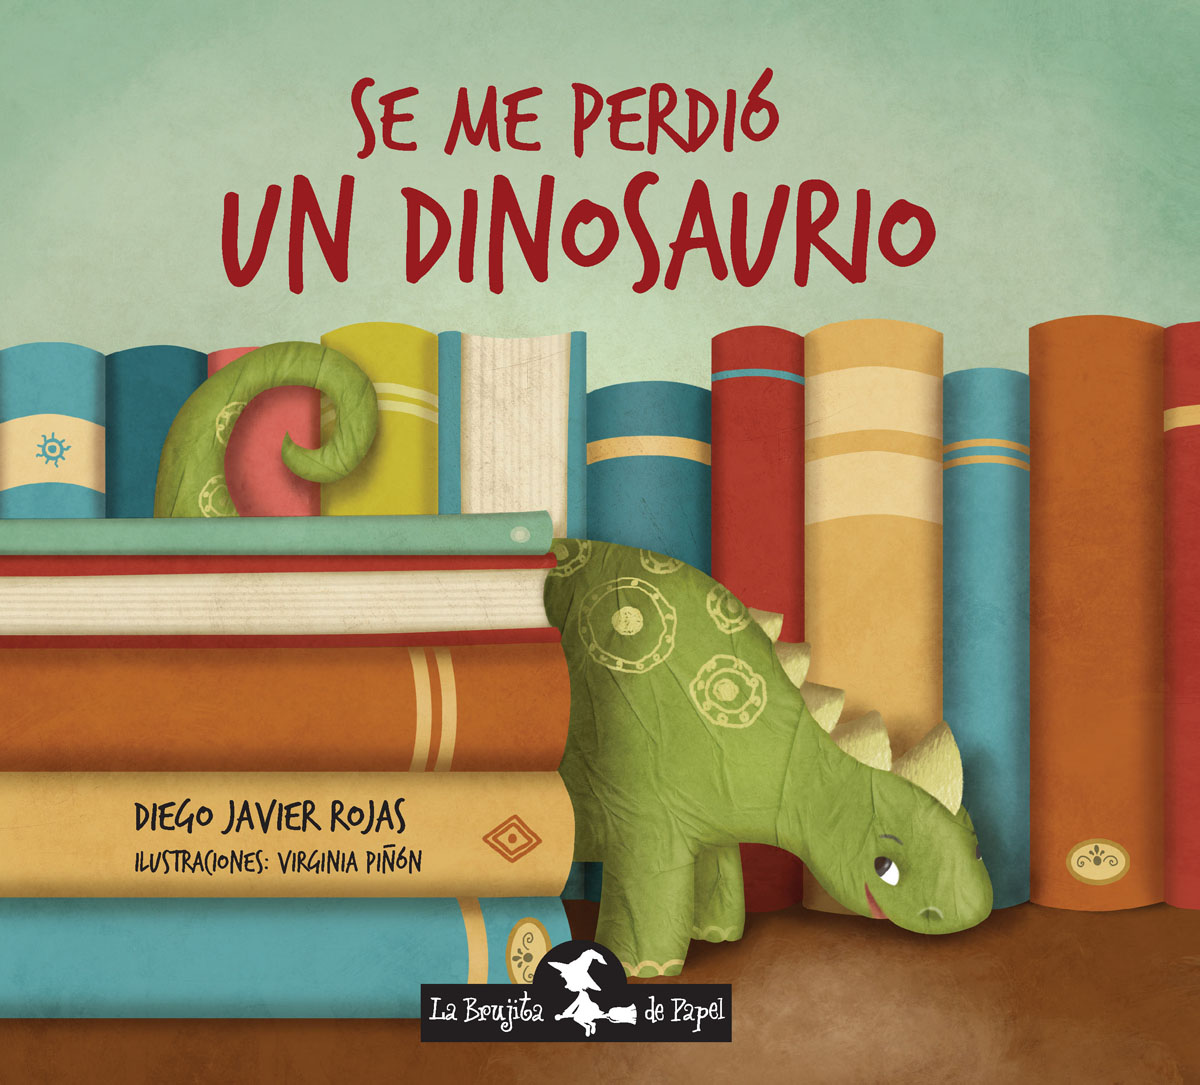 Se me perdió un dinosaurio - Rojas Diego Javier